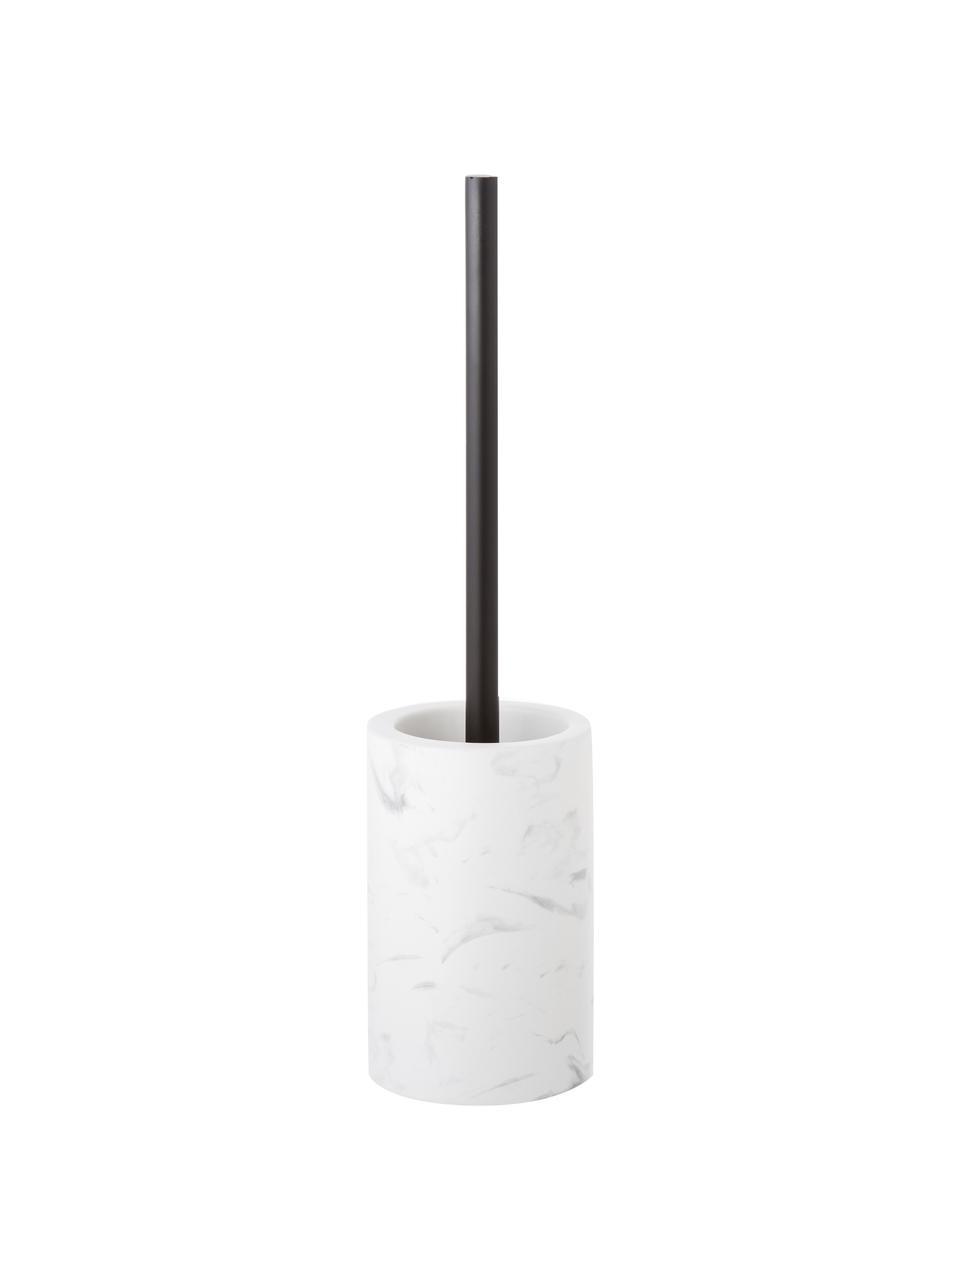 Toiletborstel Daro met keramieken houder, Houder: keramiek, Wit, zwart, Ø 10 x H 43 cm